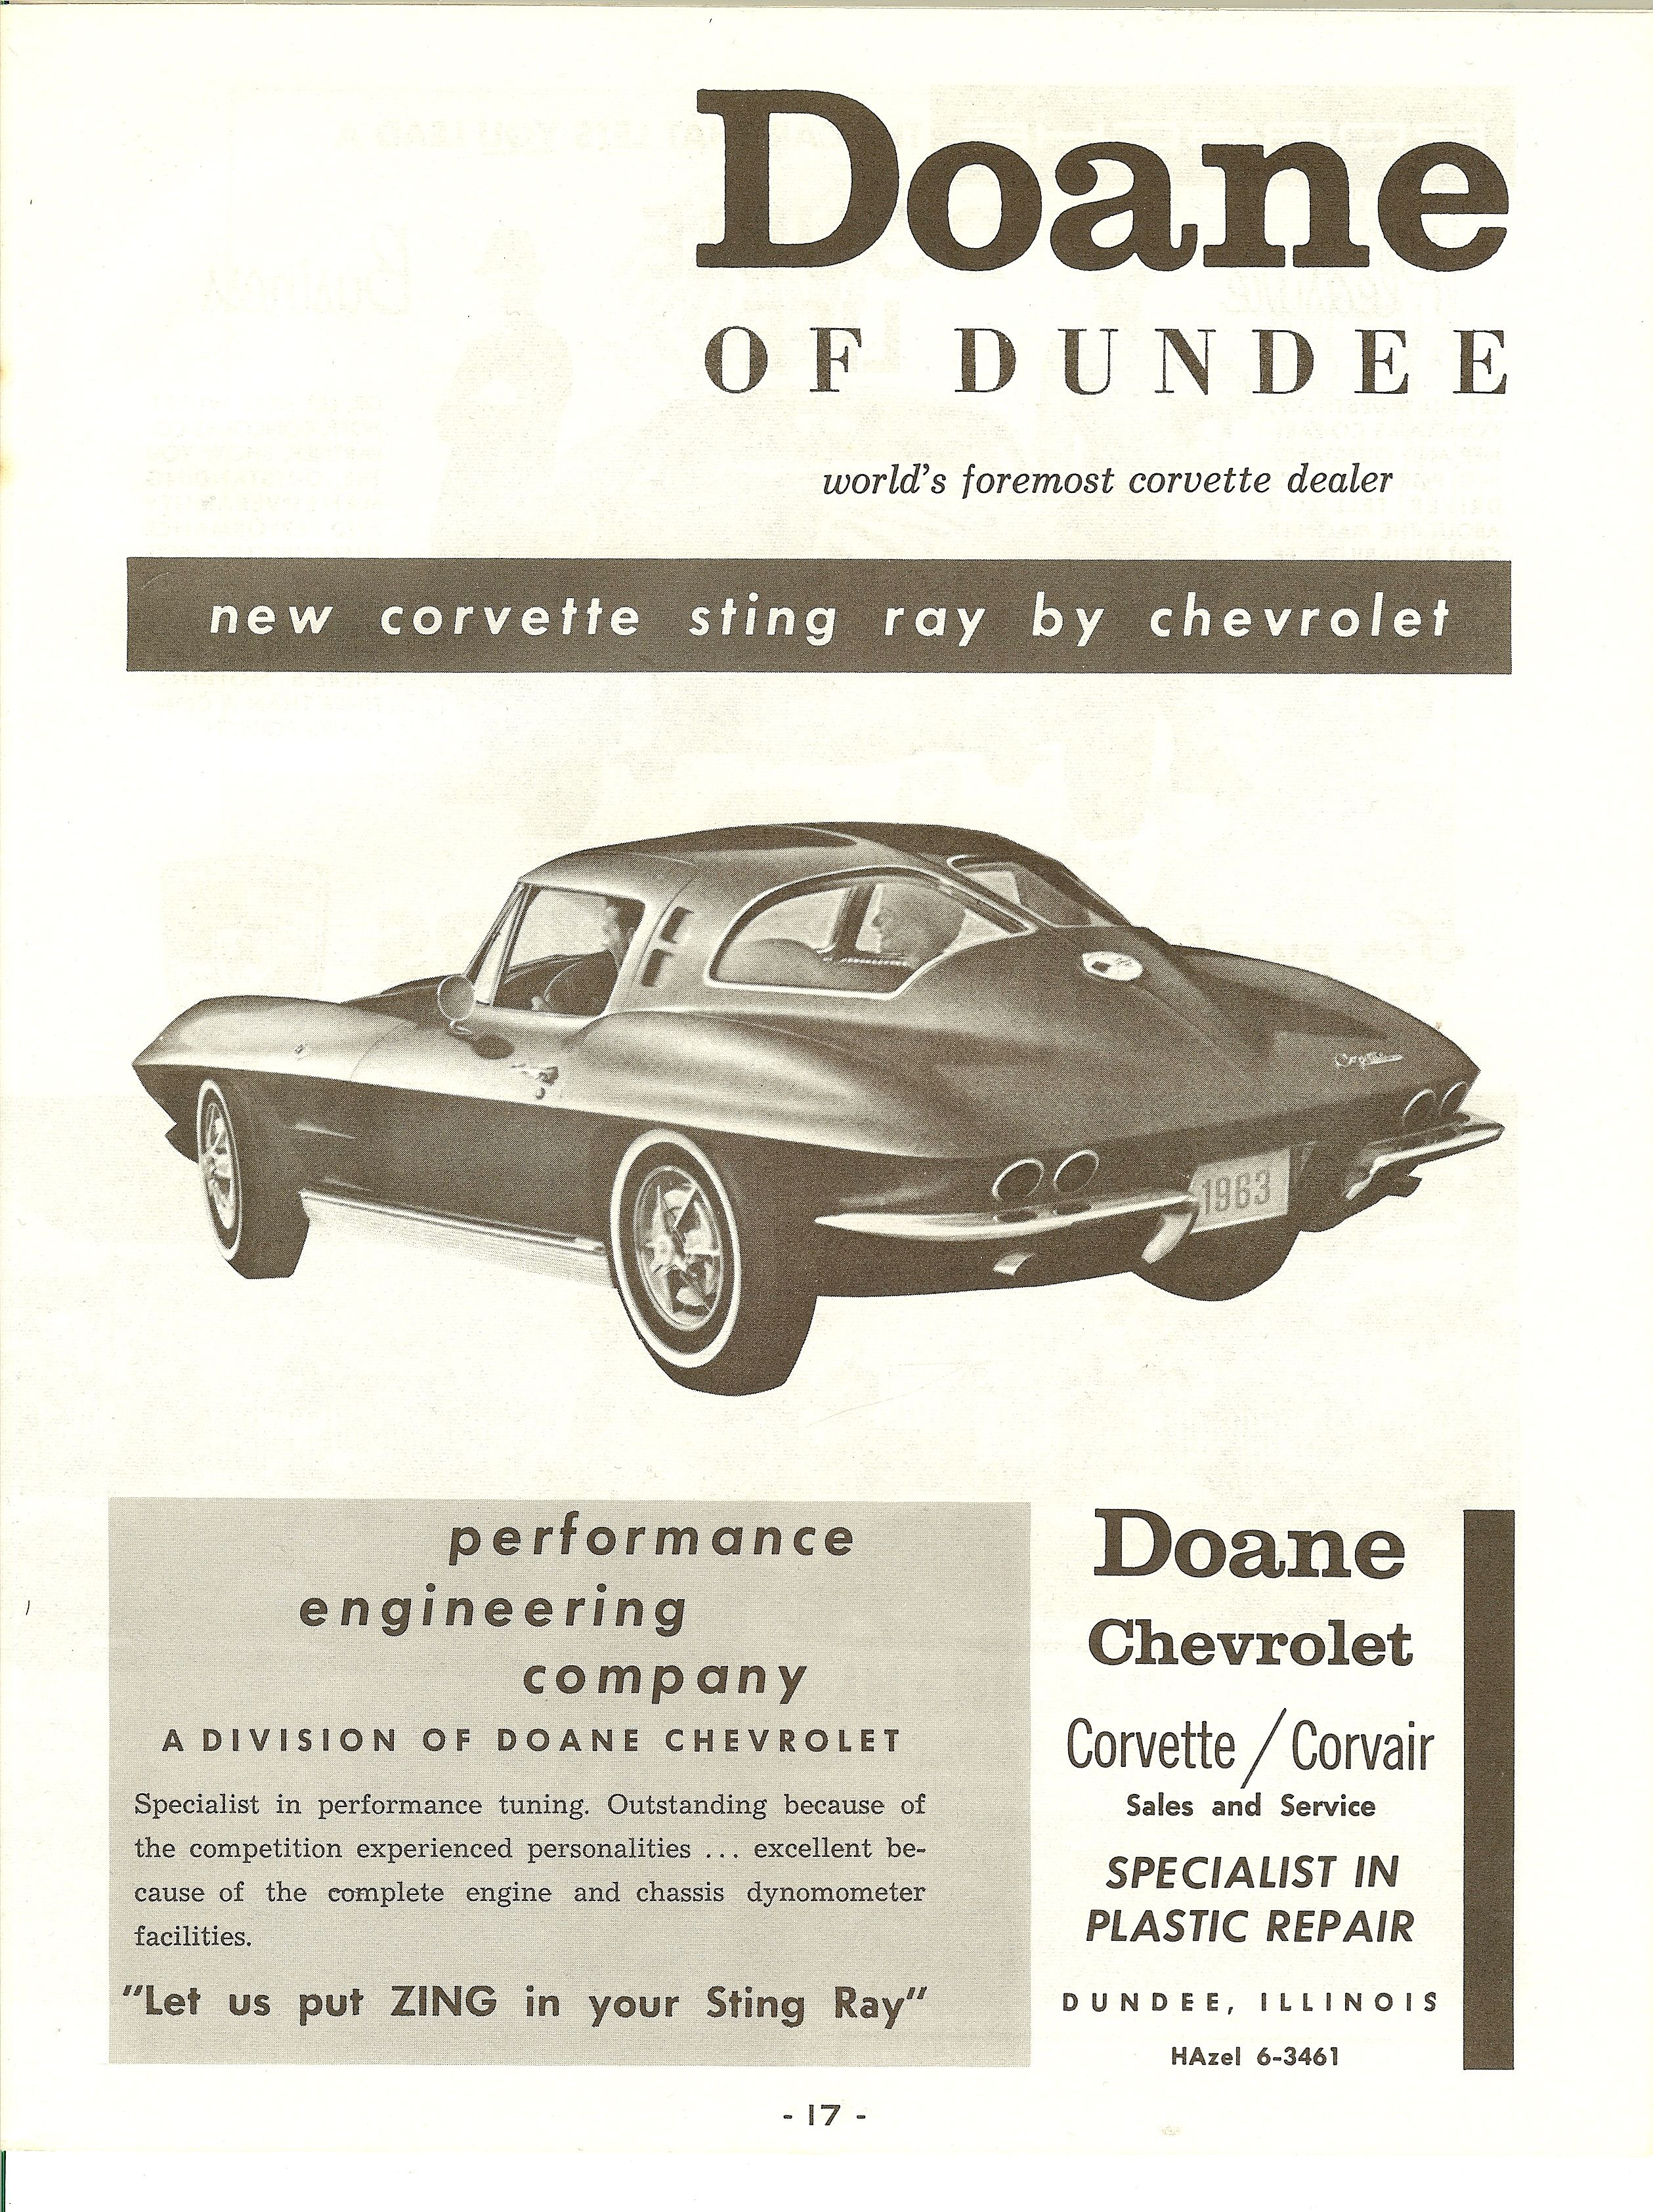 Vintage Chevrolet Dealership Advertisements Chevrolet Dealership Chevrolet Company Chevy Dealerships